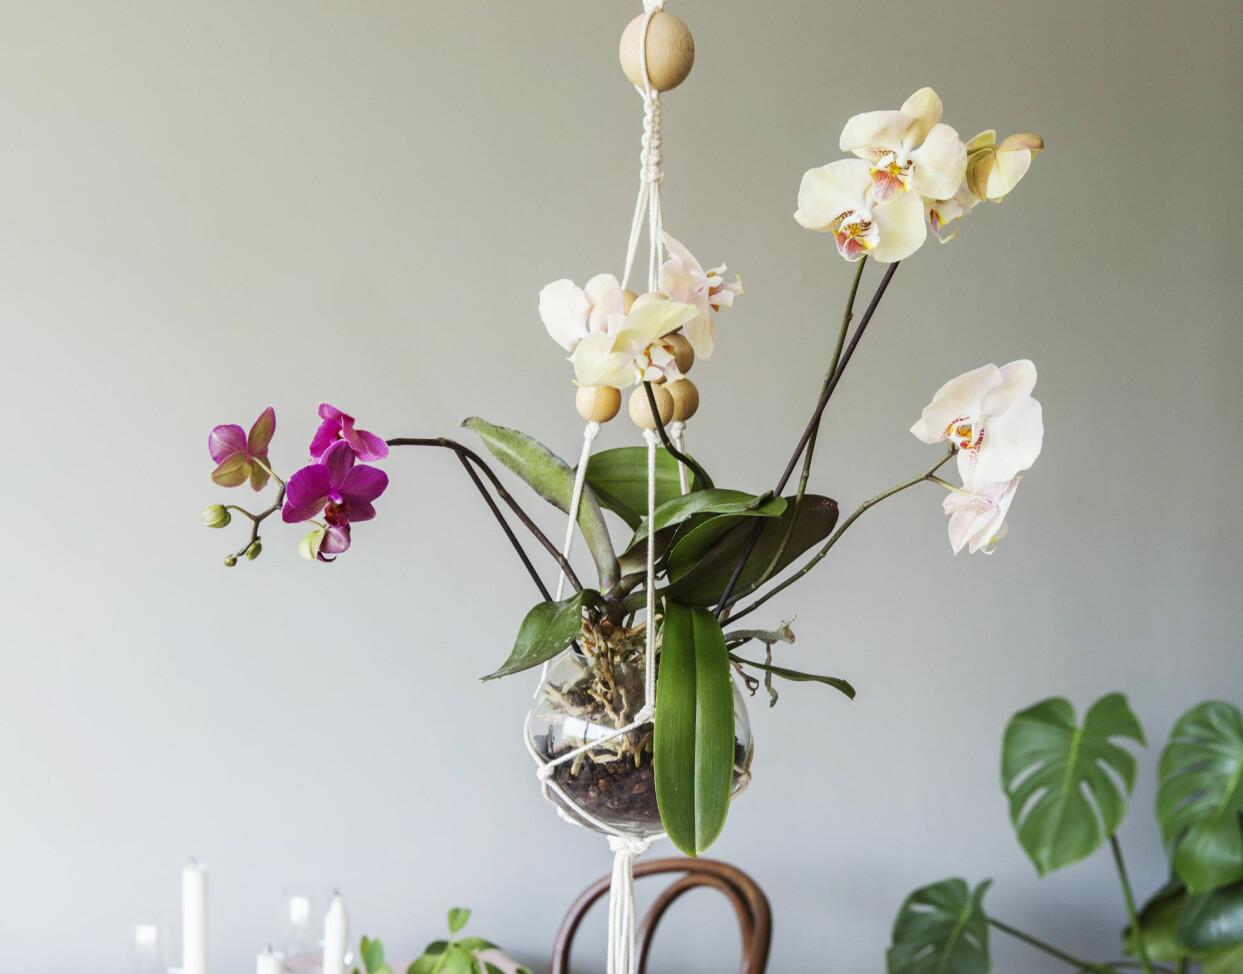 Arrangemang av orkidéer som svävar i luften.